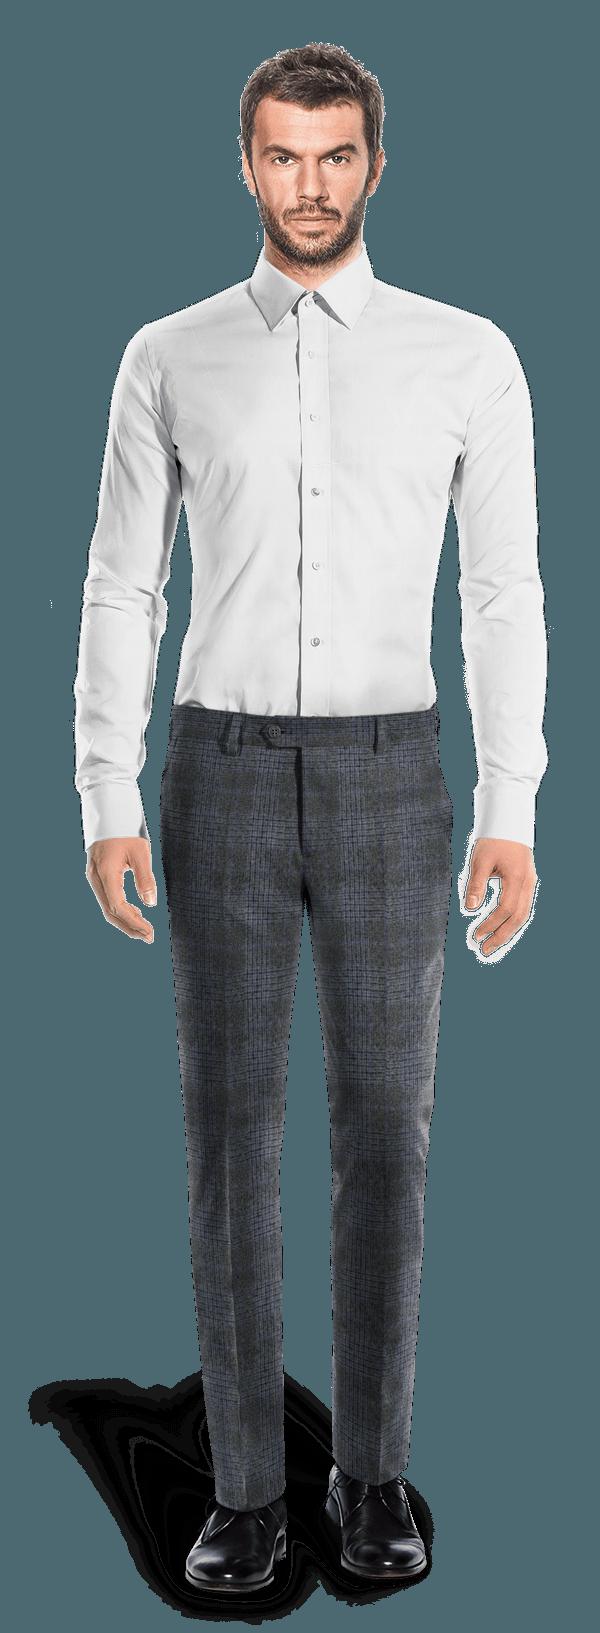 Graue karierte Hose aus Wolle